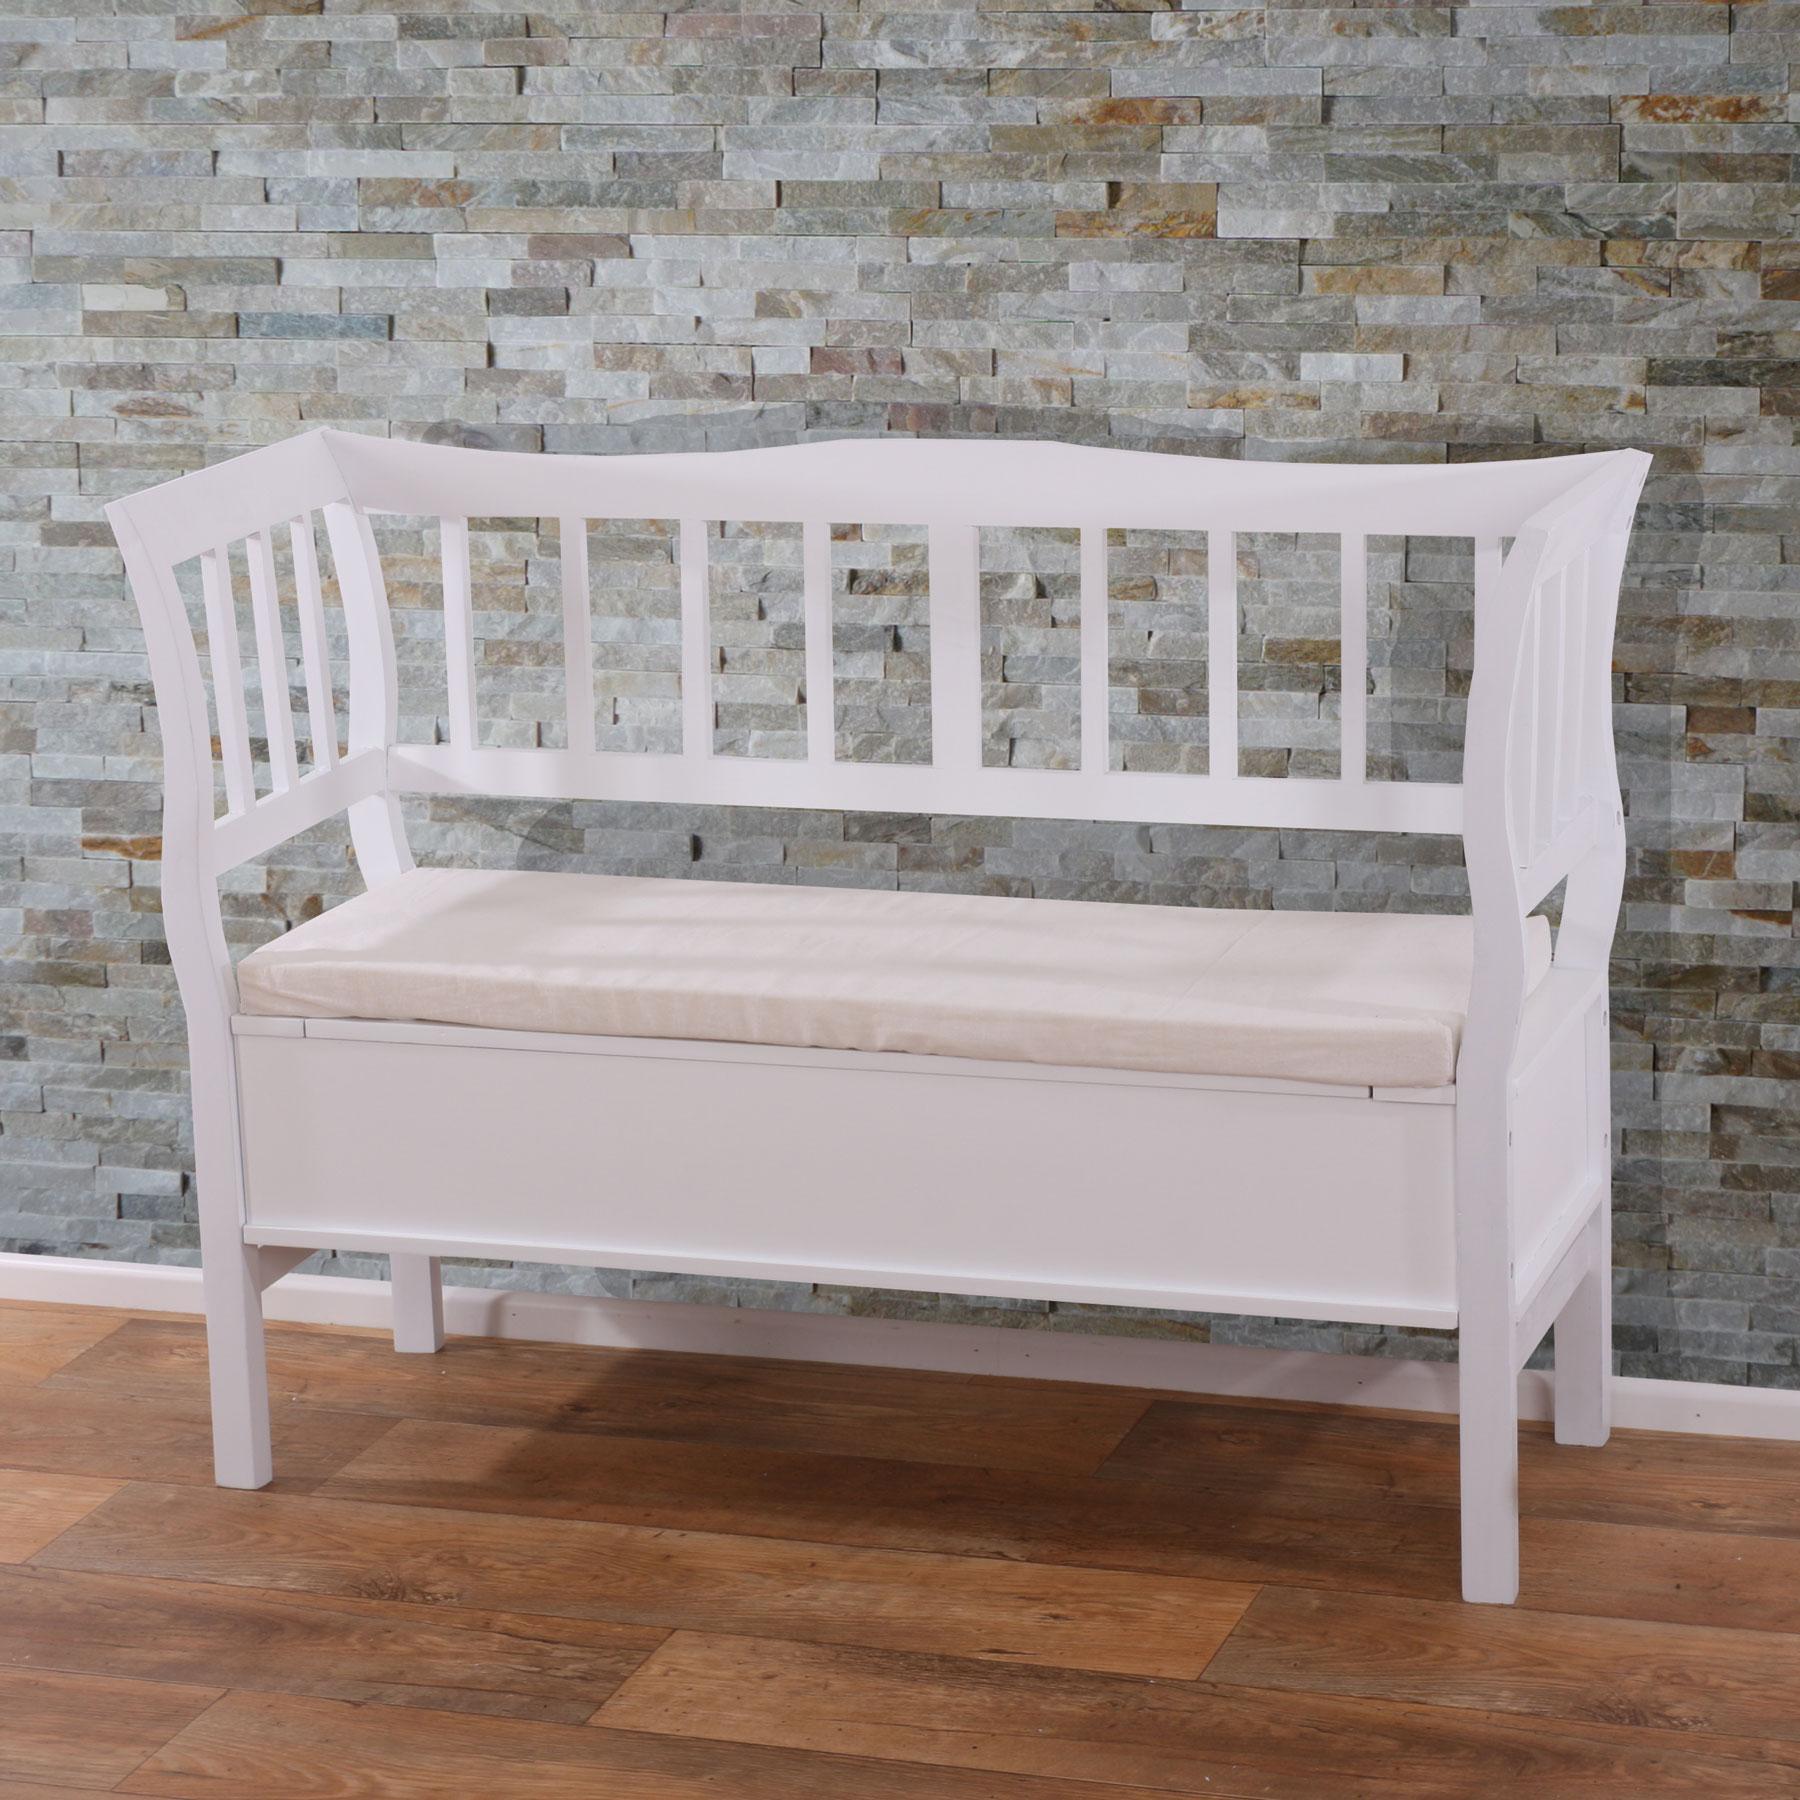 sitzbank h207 bank truhenbank staufach kissen wei ge lt ebay. Black Bedroom Furniture Sets. Home Design Ideas